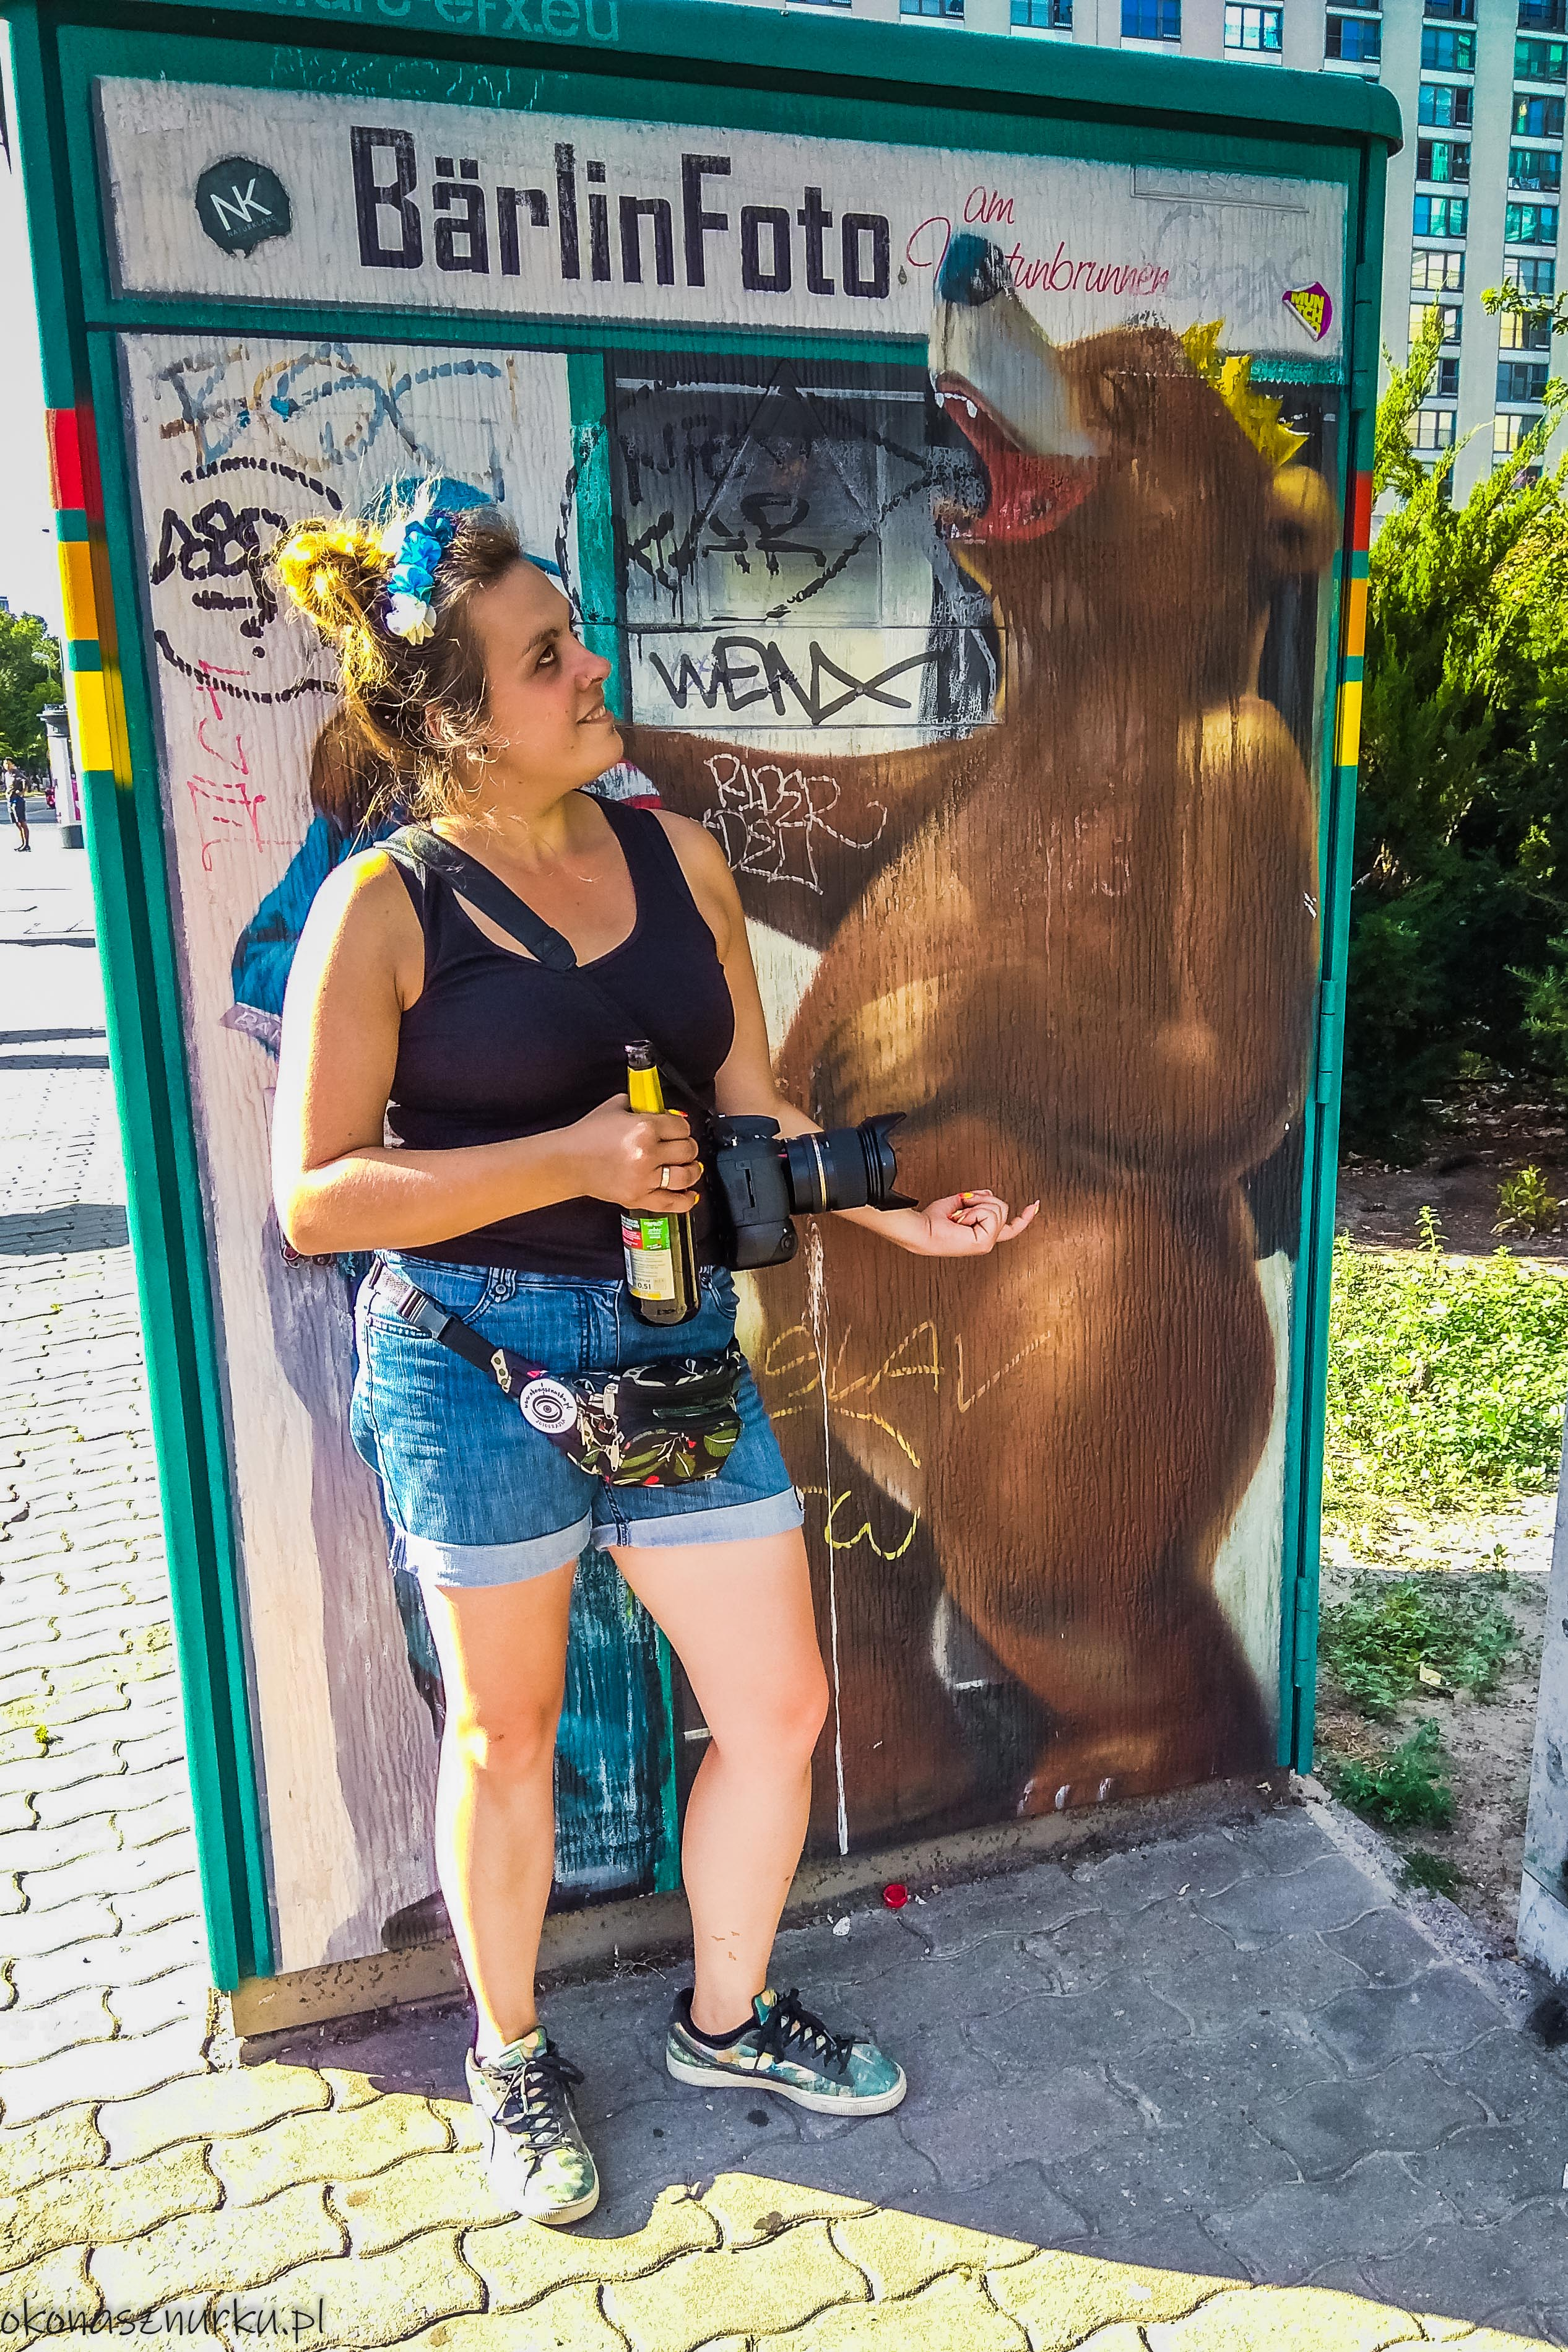 berlin-okonasznurku